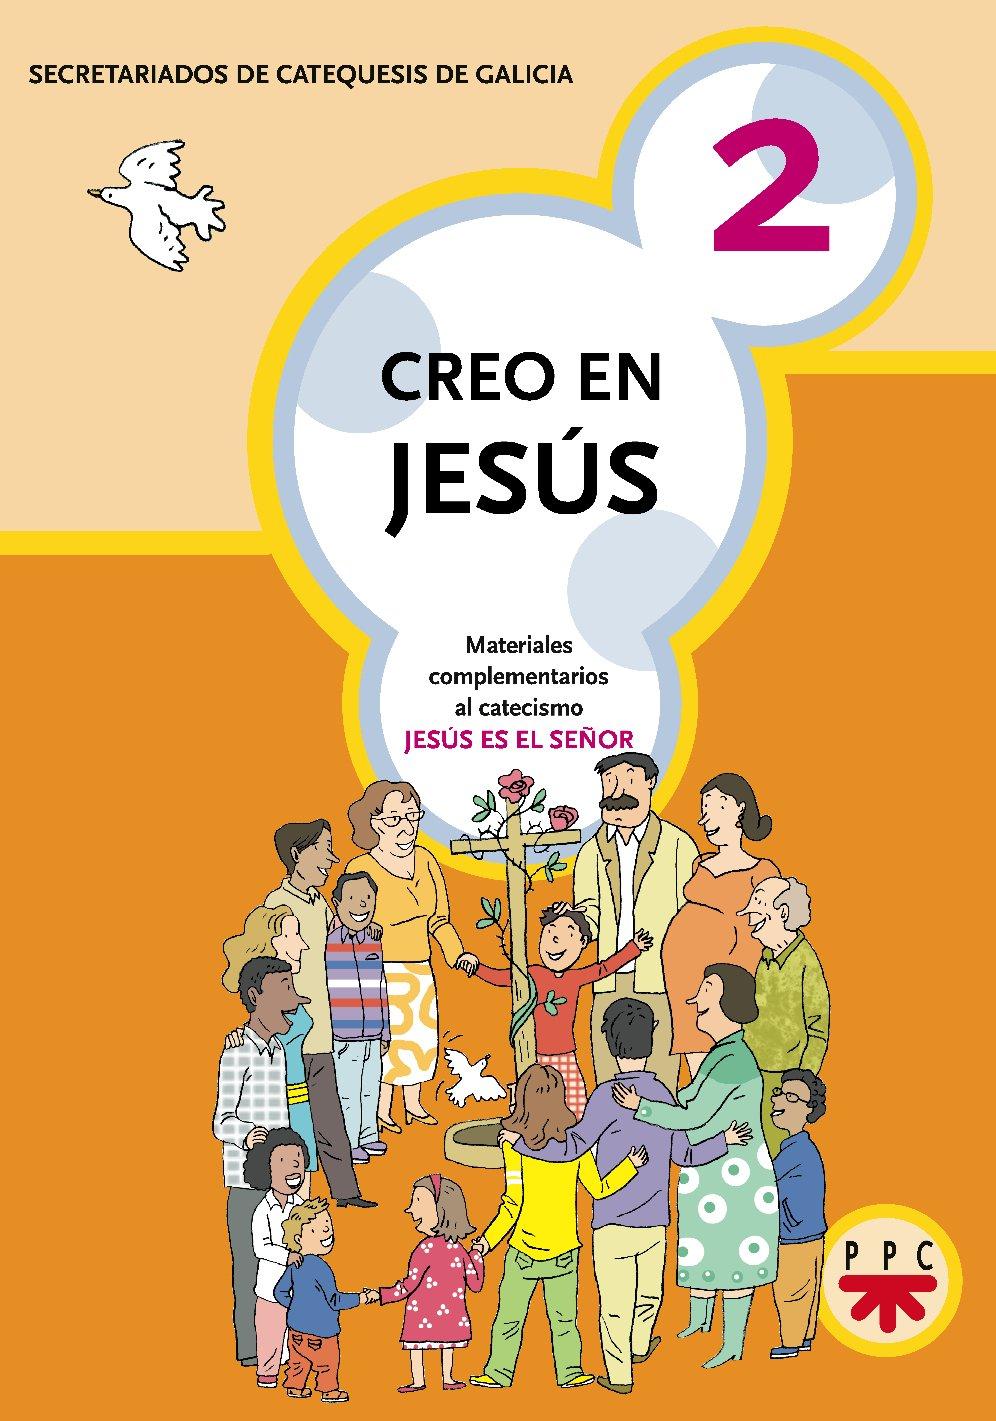 Creo En Jesús 2 (Catequesis Galicia) Tapa blanda – 1 mar 2005 PPC 8428820430 Religious instruction EDUCATION / General